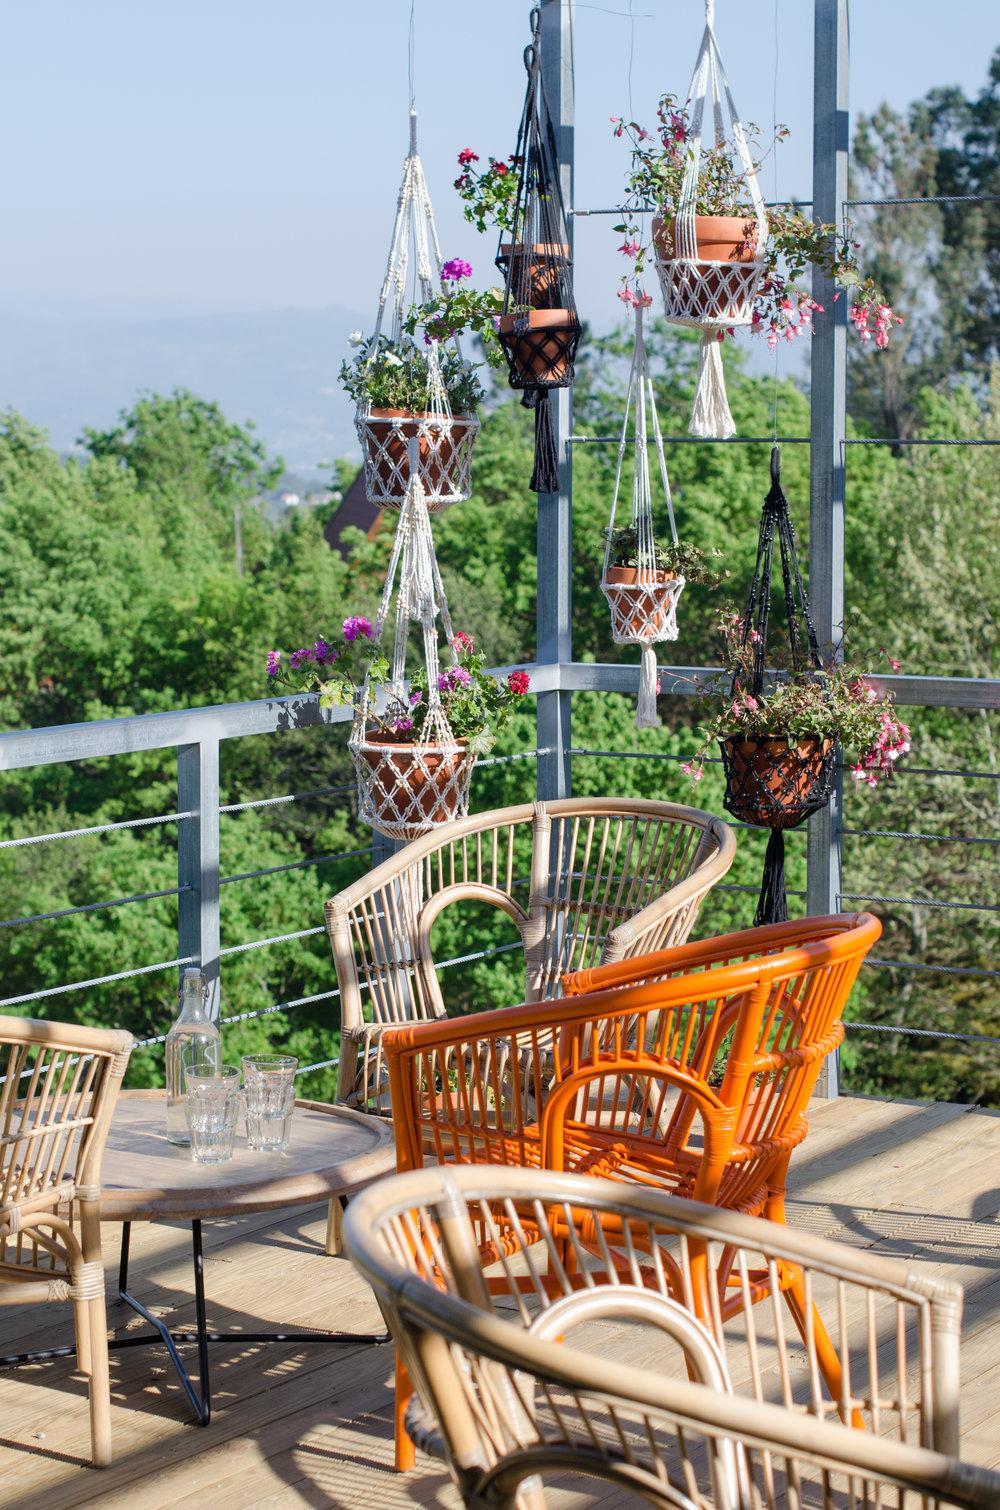 mainhouse_terrace_7-Romina Noel Campanelli.jpg